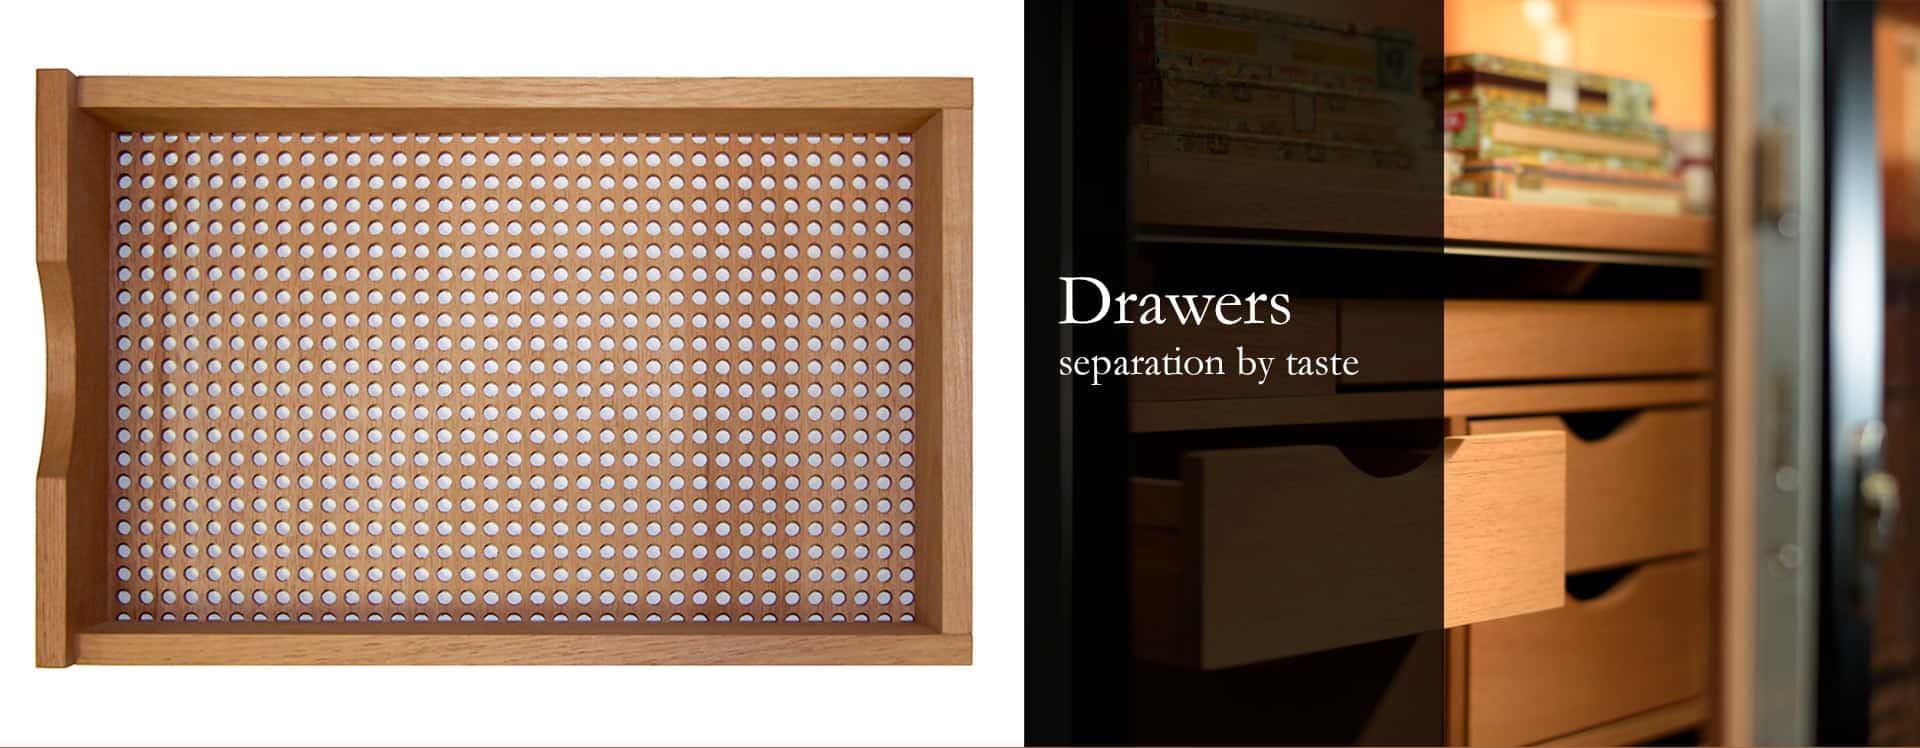 Gerber Humidors drawers